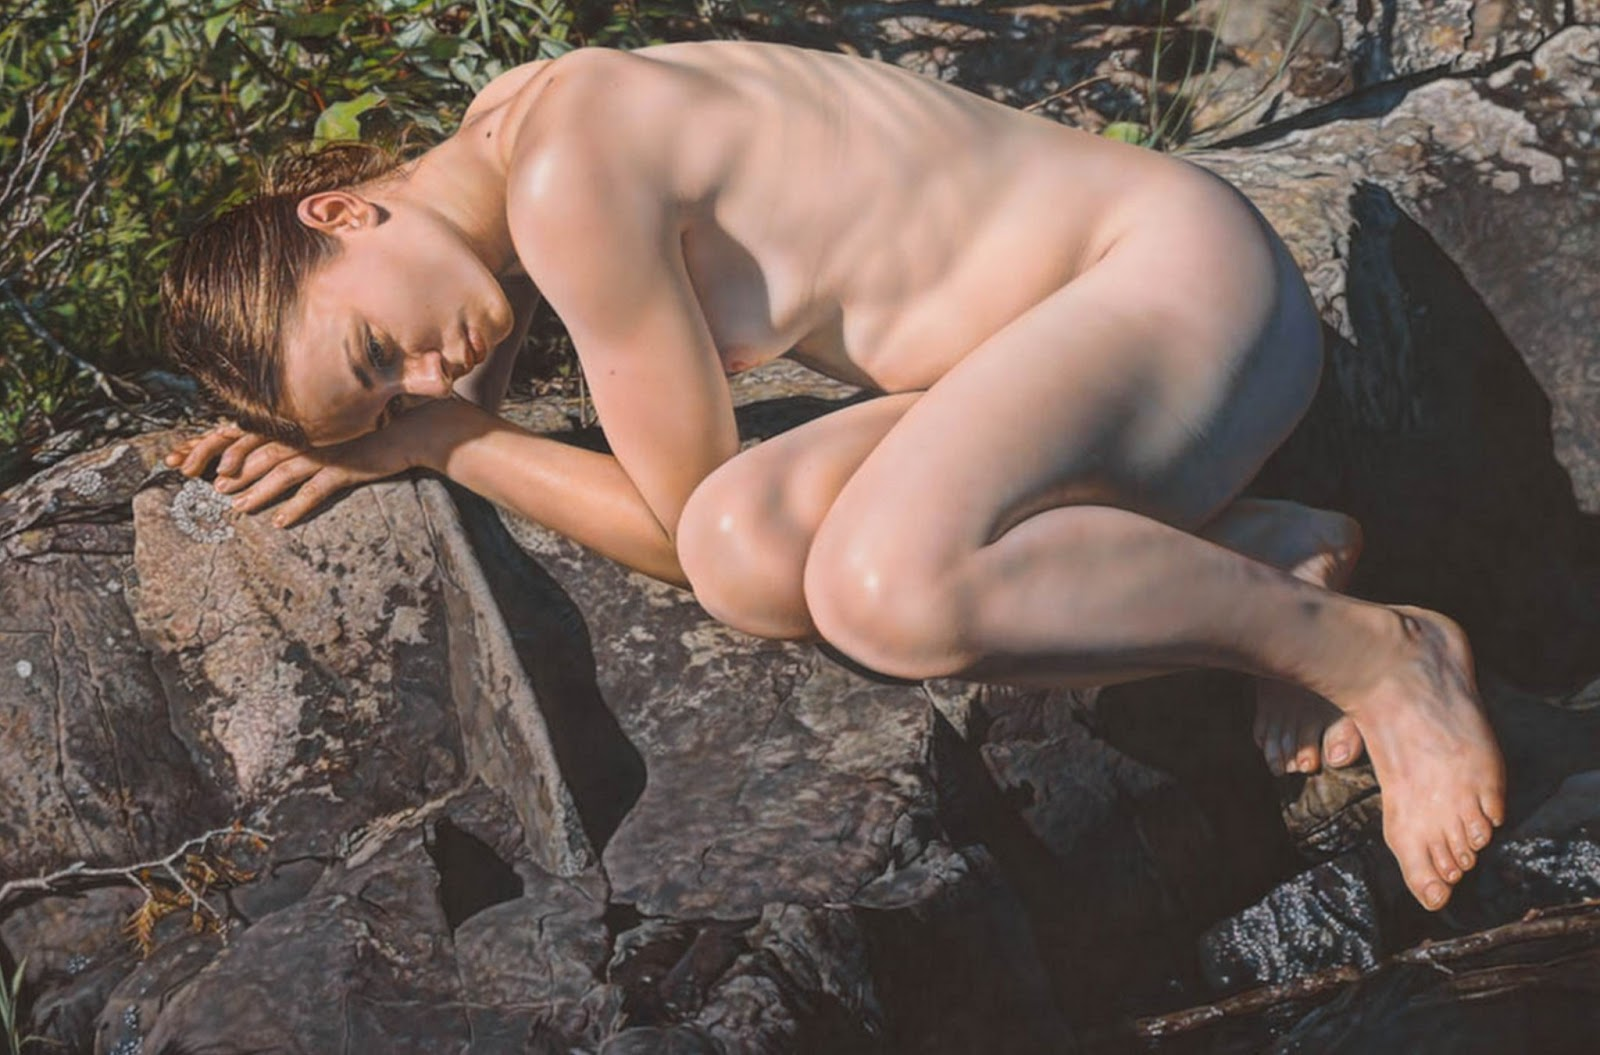 Art Stica Hiperrealista Cuadrosde Mujeres Desnudas Pintadas Al Leo